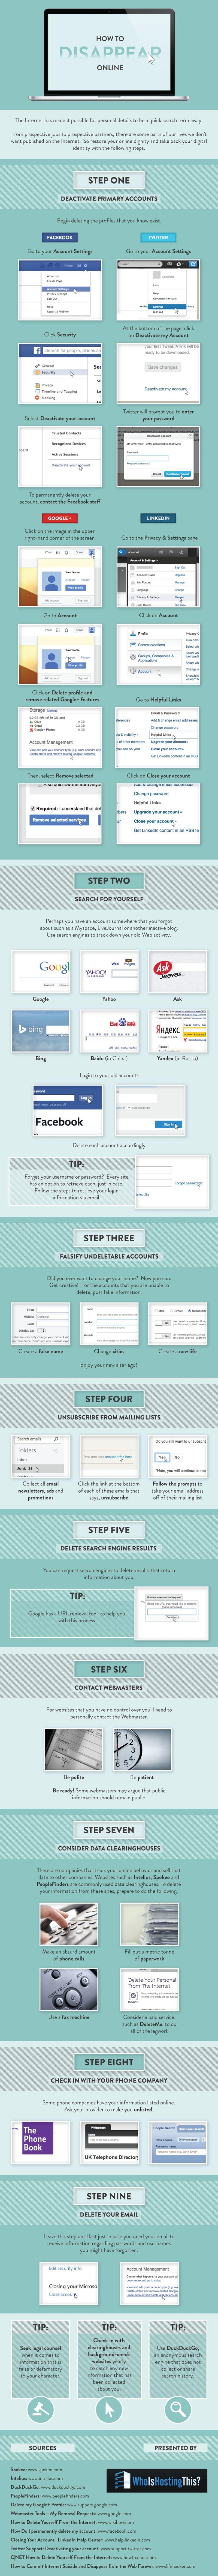 Como eliminar tu rastro de internet en 9 pasos (infografía)